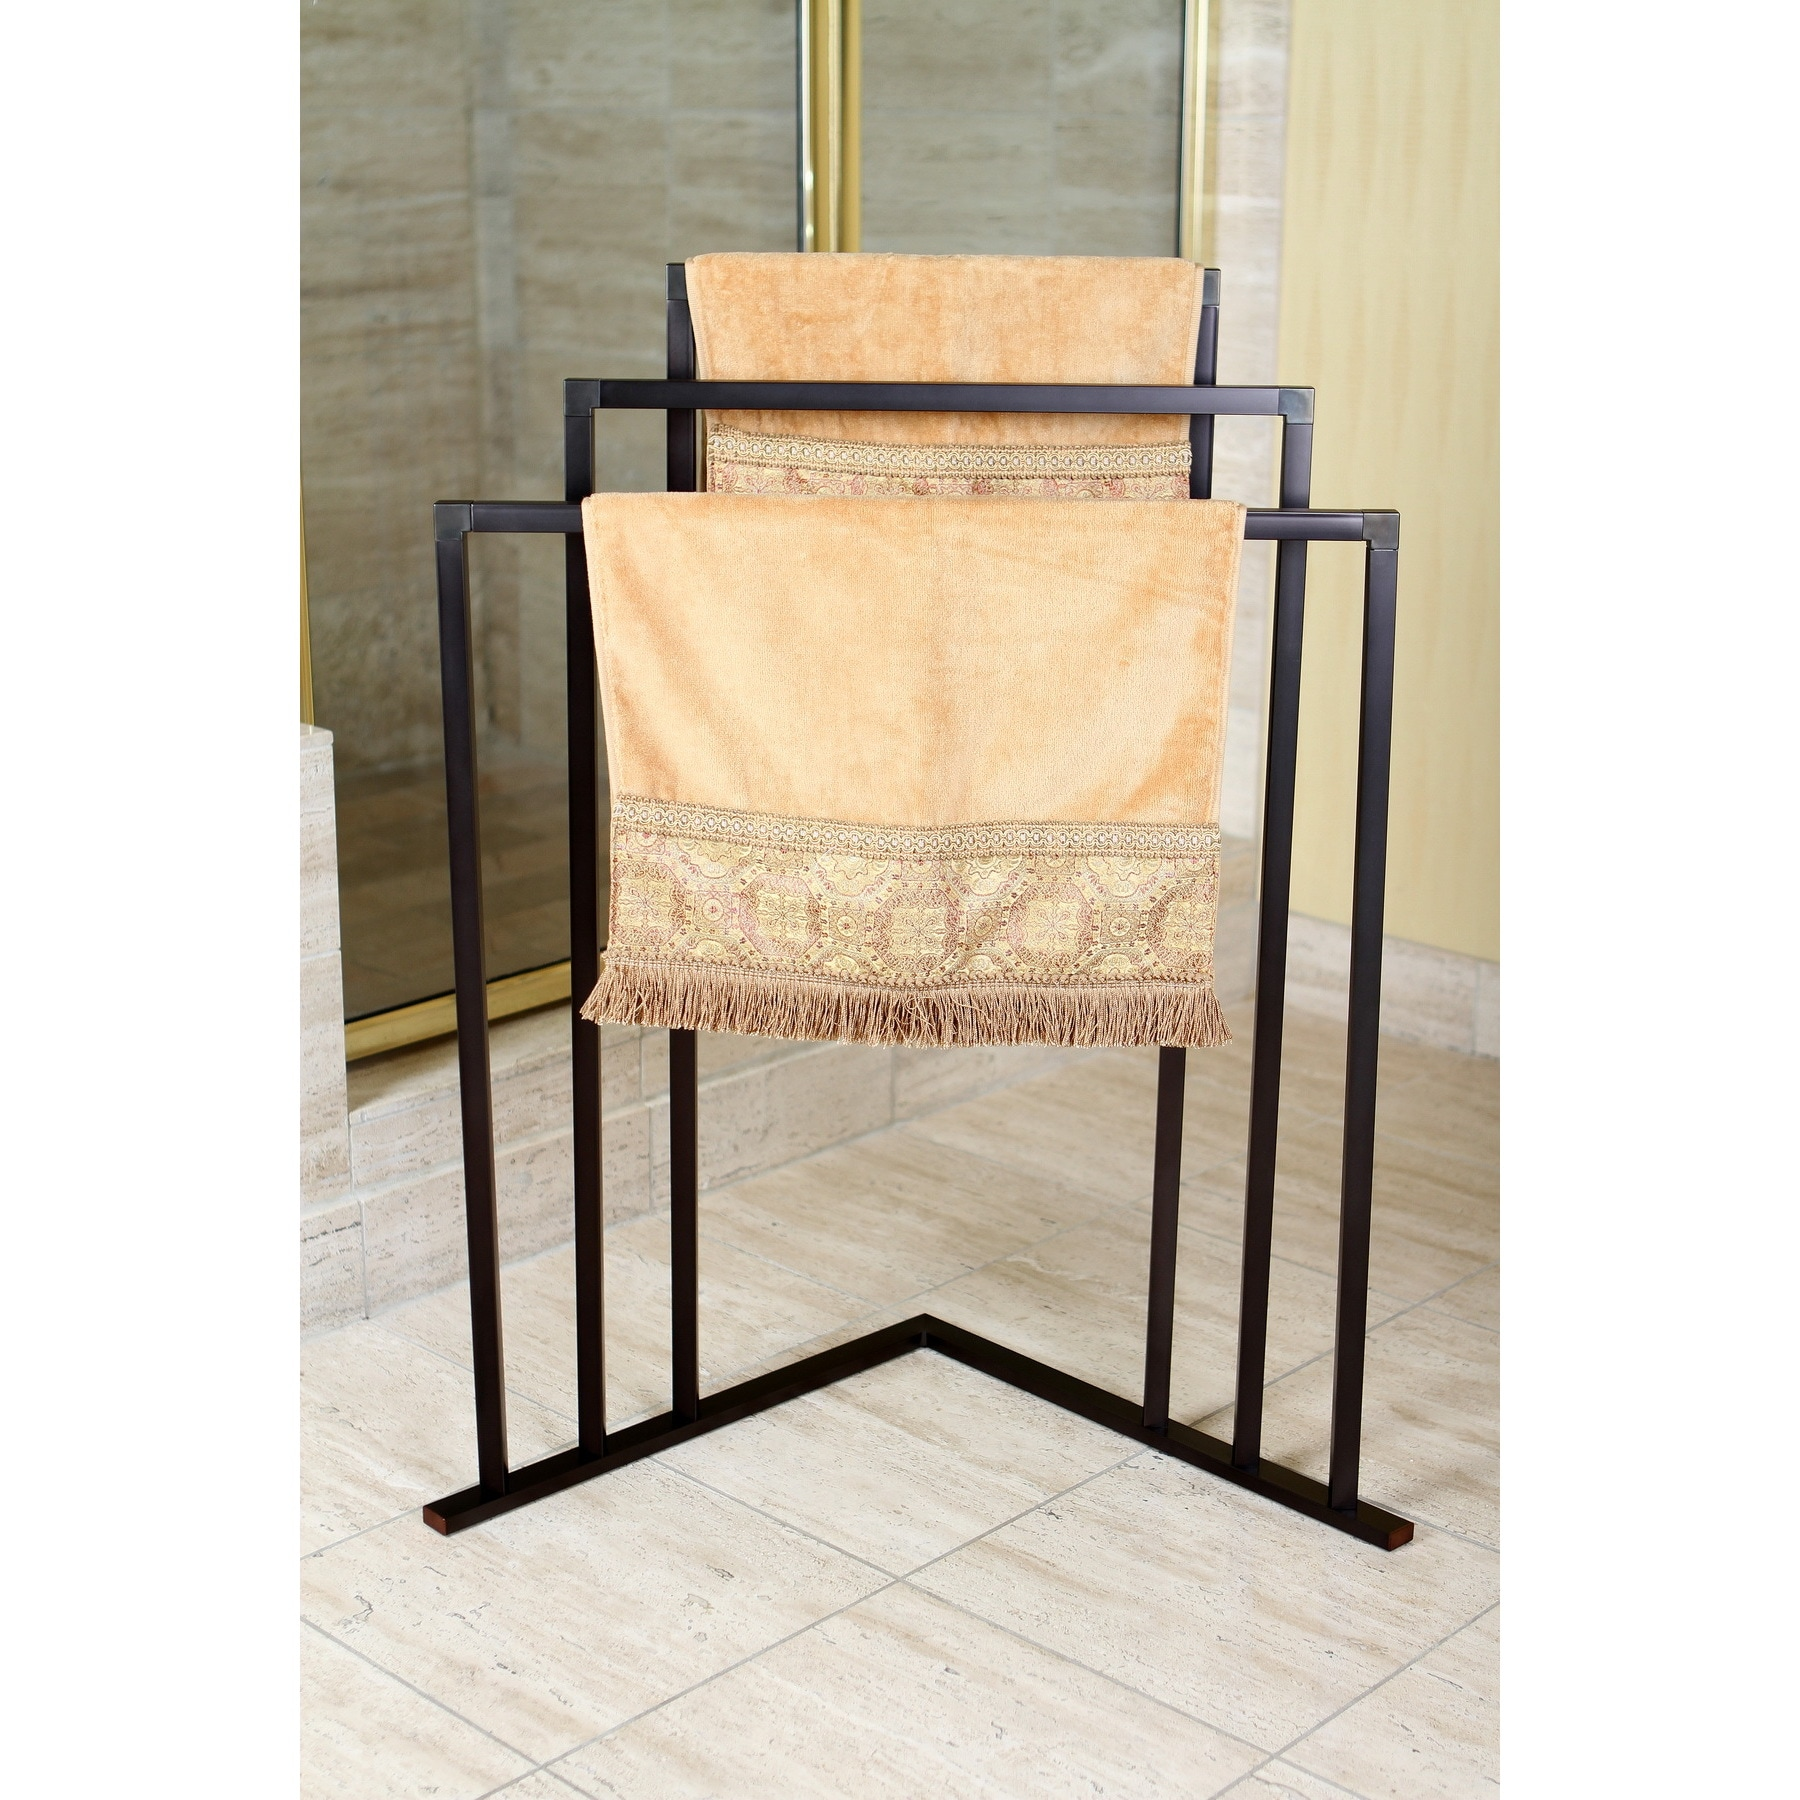 Shop Oil Rubbed Bronze 3-tier Iron Construction Corner Towel Rack ...